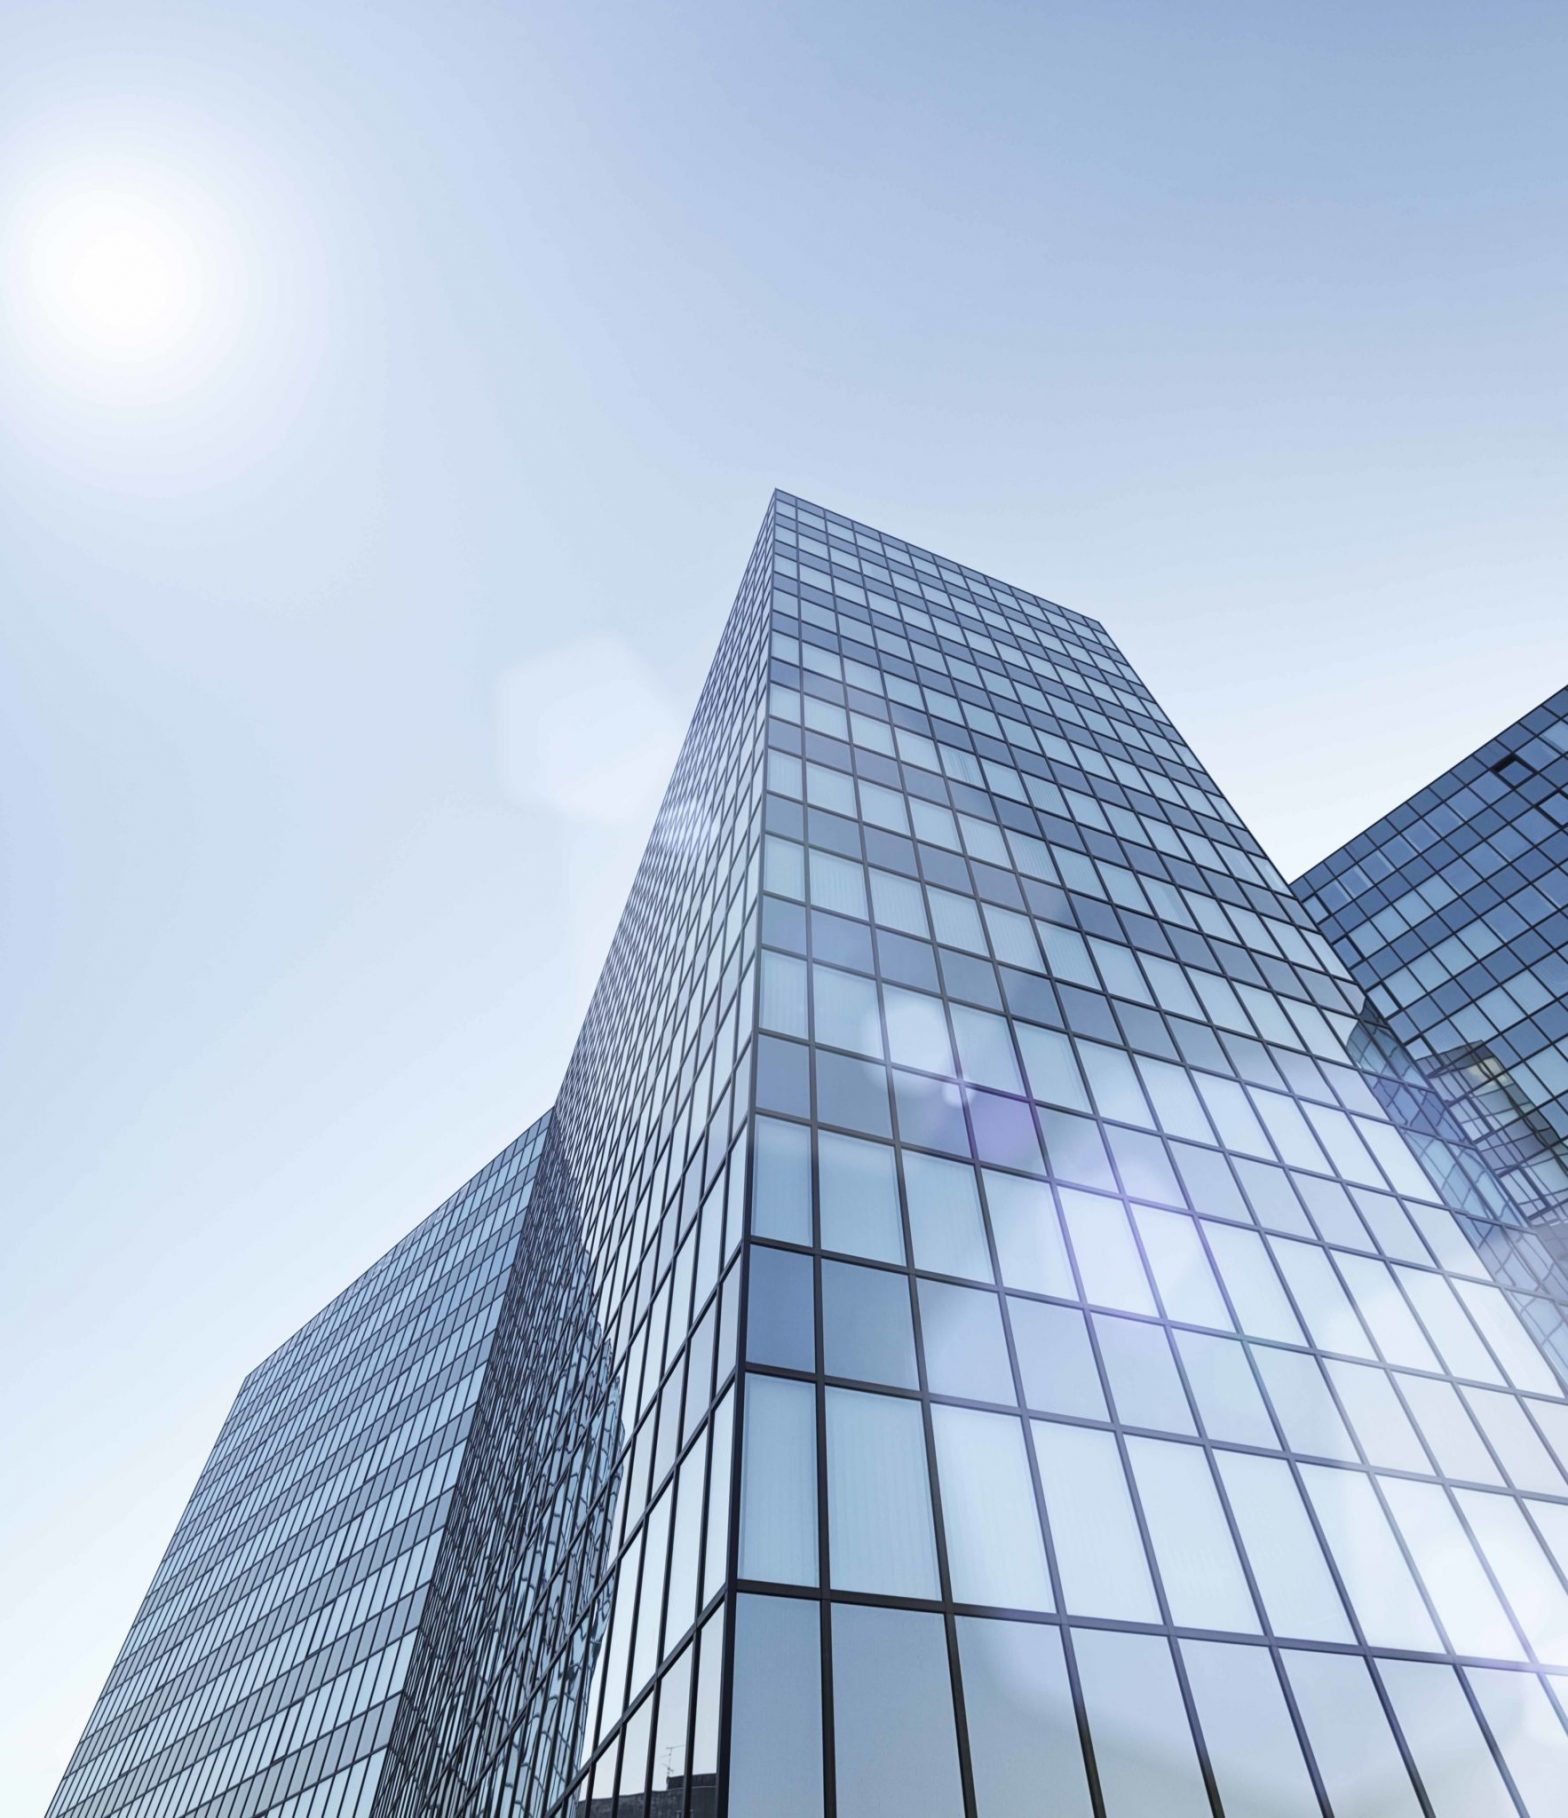 2015 Commercial Real Estate Market Outlook